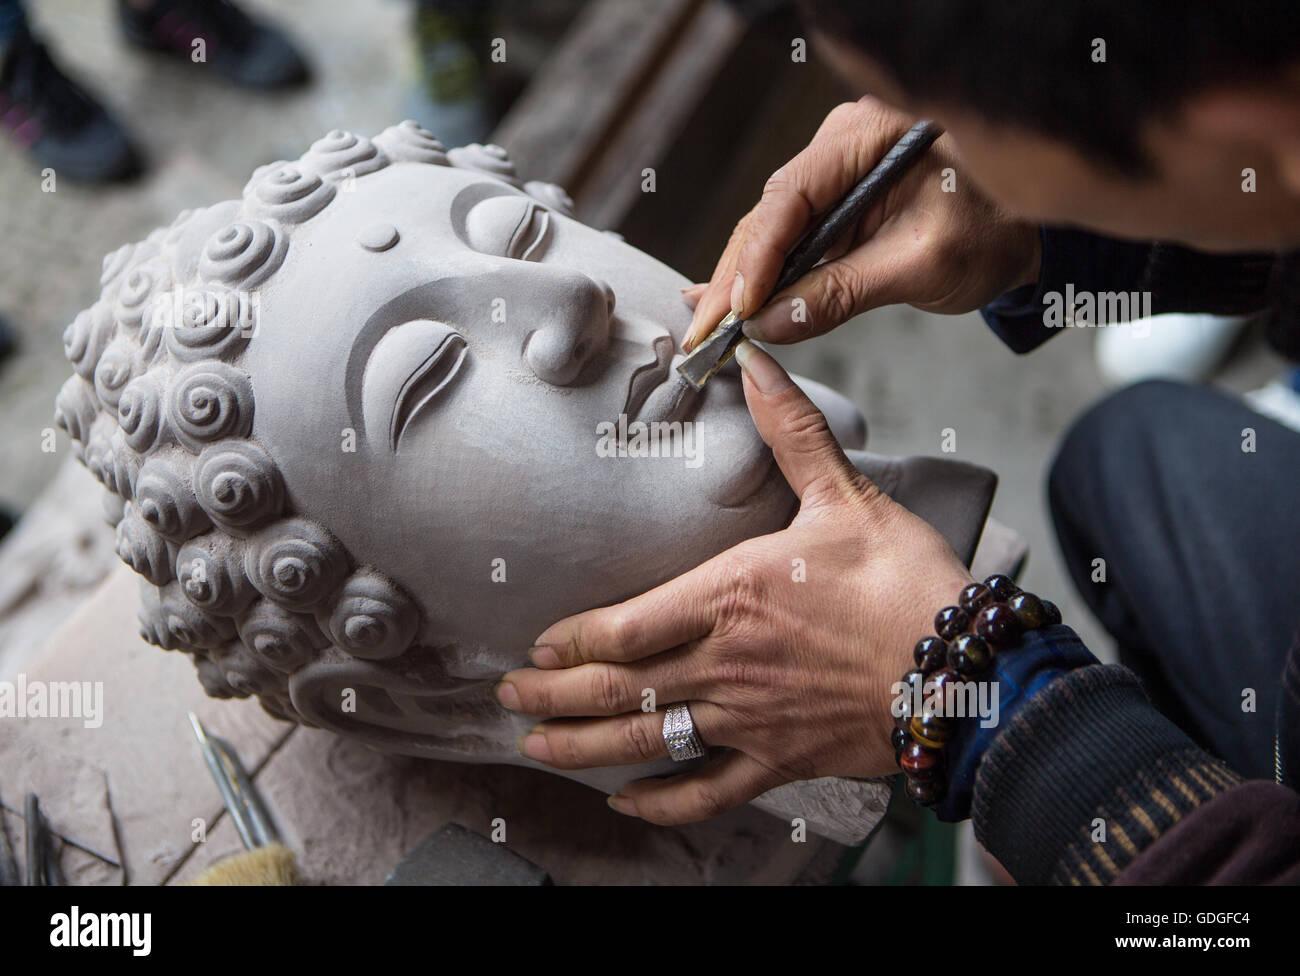 China,Chongqing City,artist - Stock Image